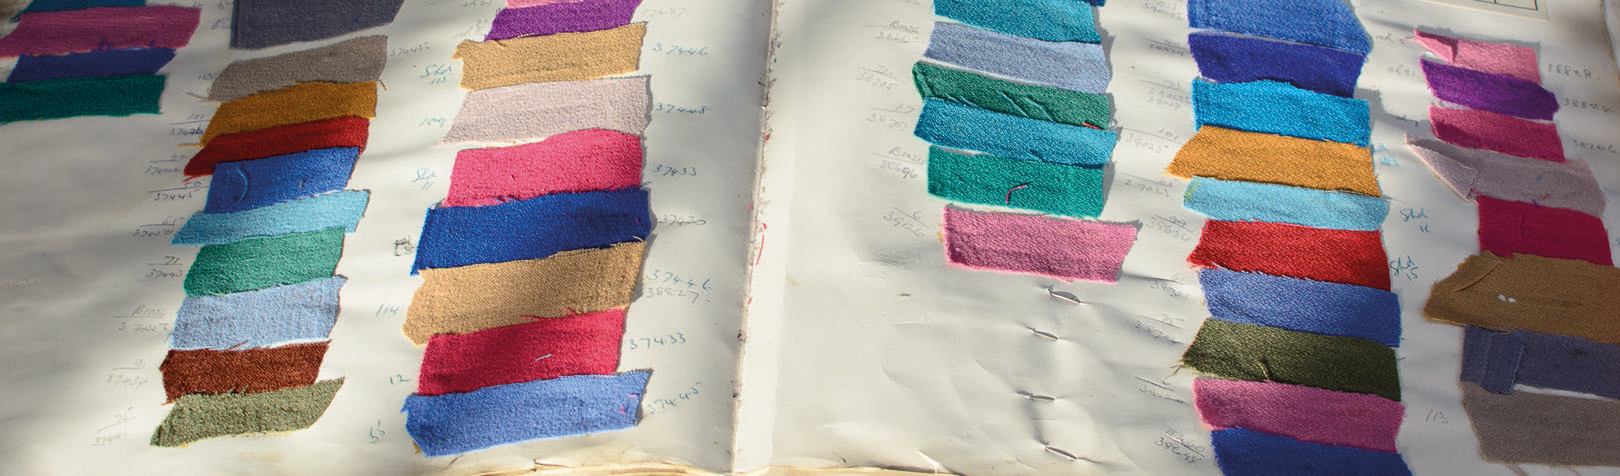 fabric_book_2